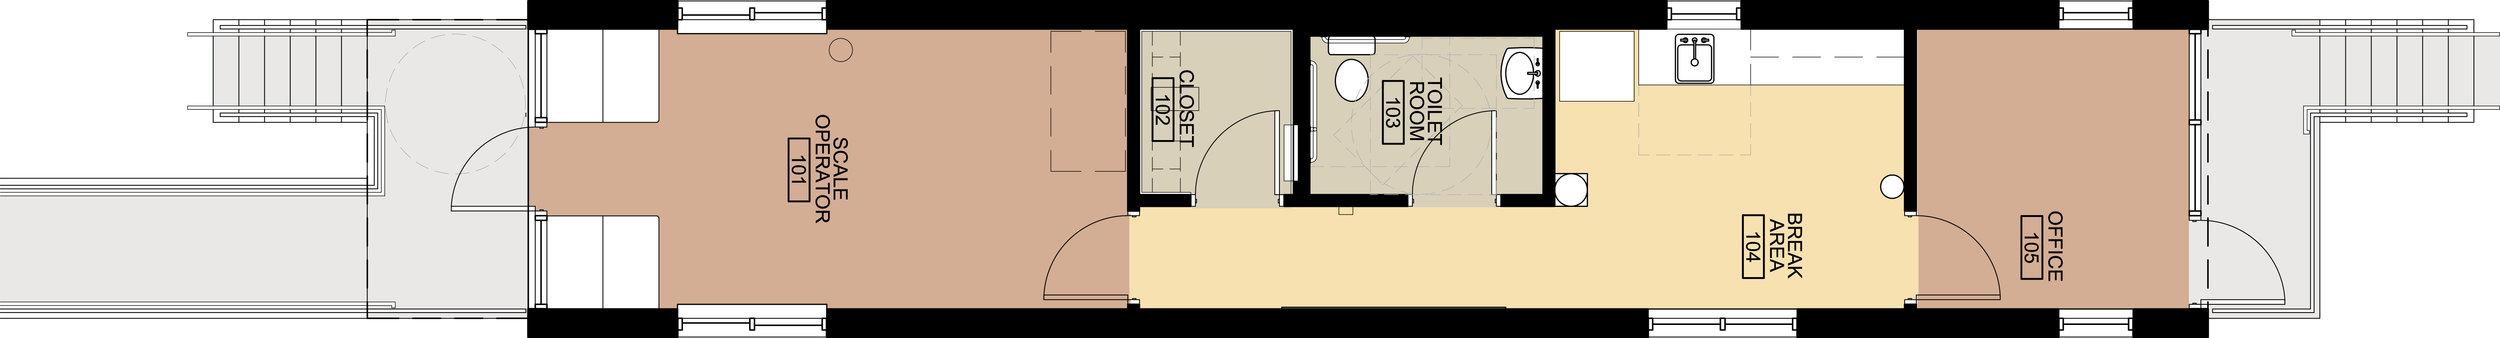 Floor Plan Colored (Scalehouse).jpg